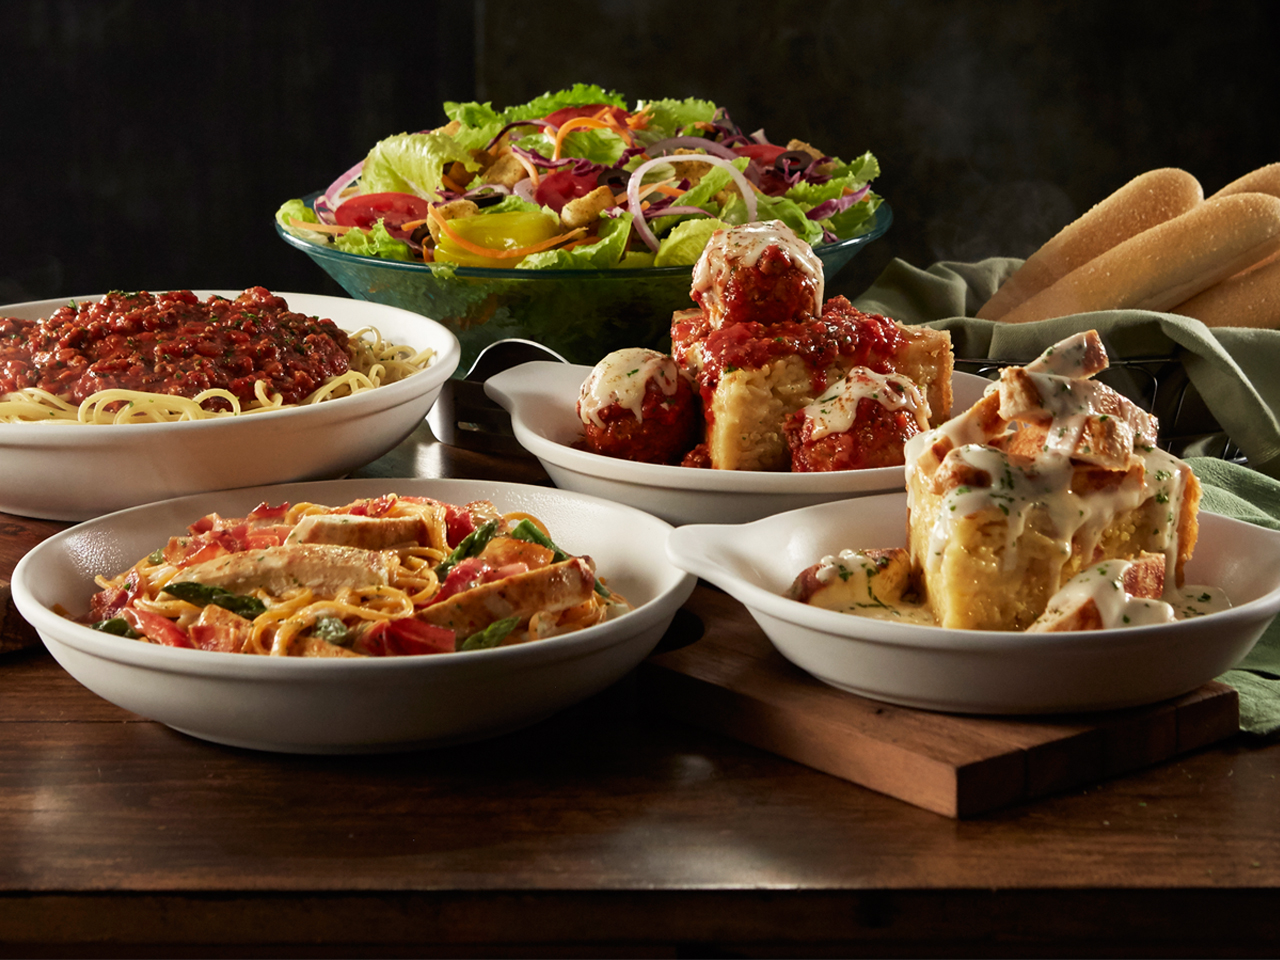 Olive Garden Italian Restaurant, Stroudsburg PA